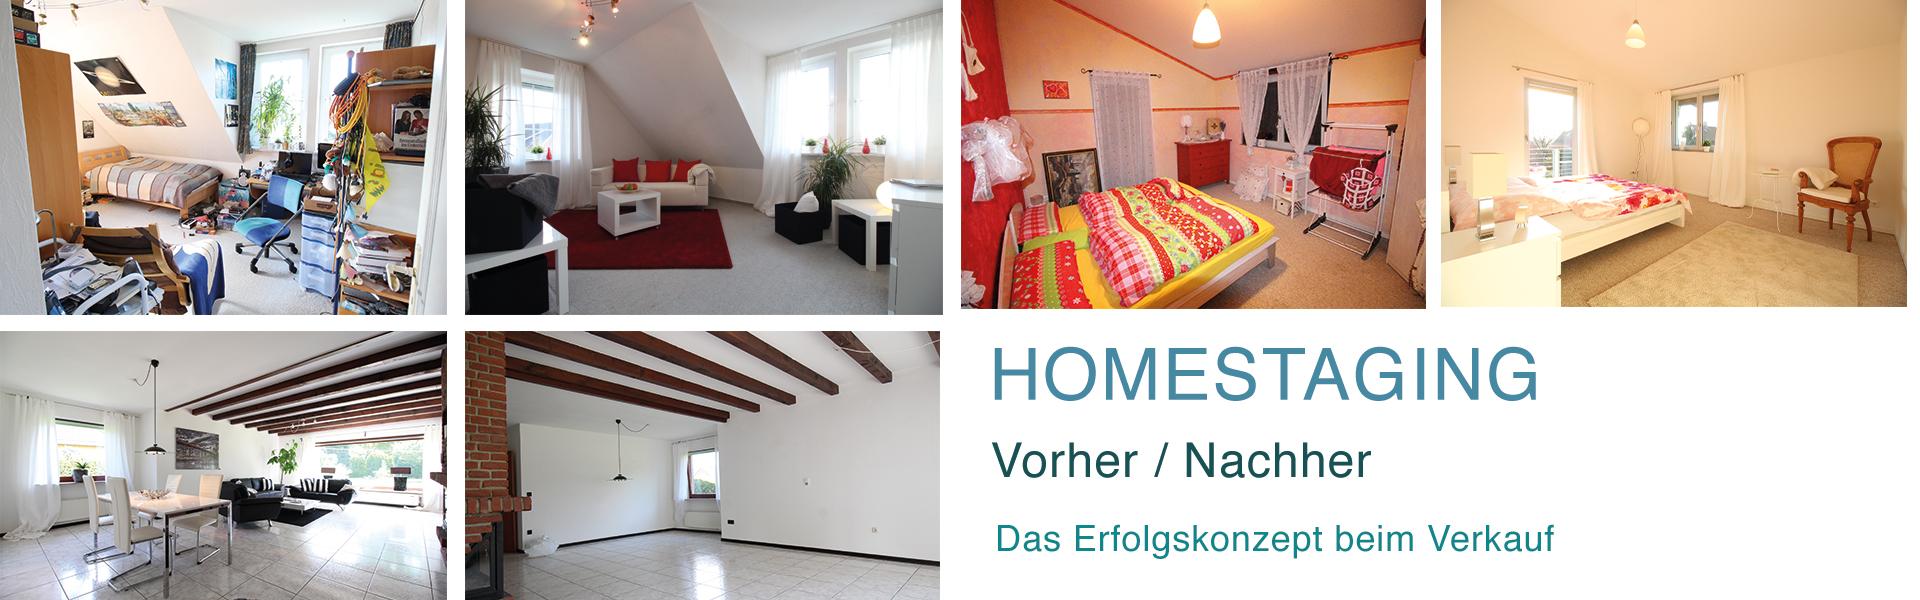 Best Home Staging Verkauf Immobilien Photos - Ridgewayng.com - ridgewayng.com